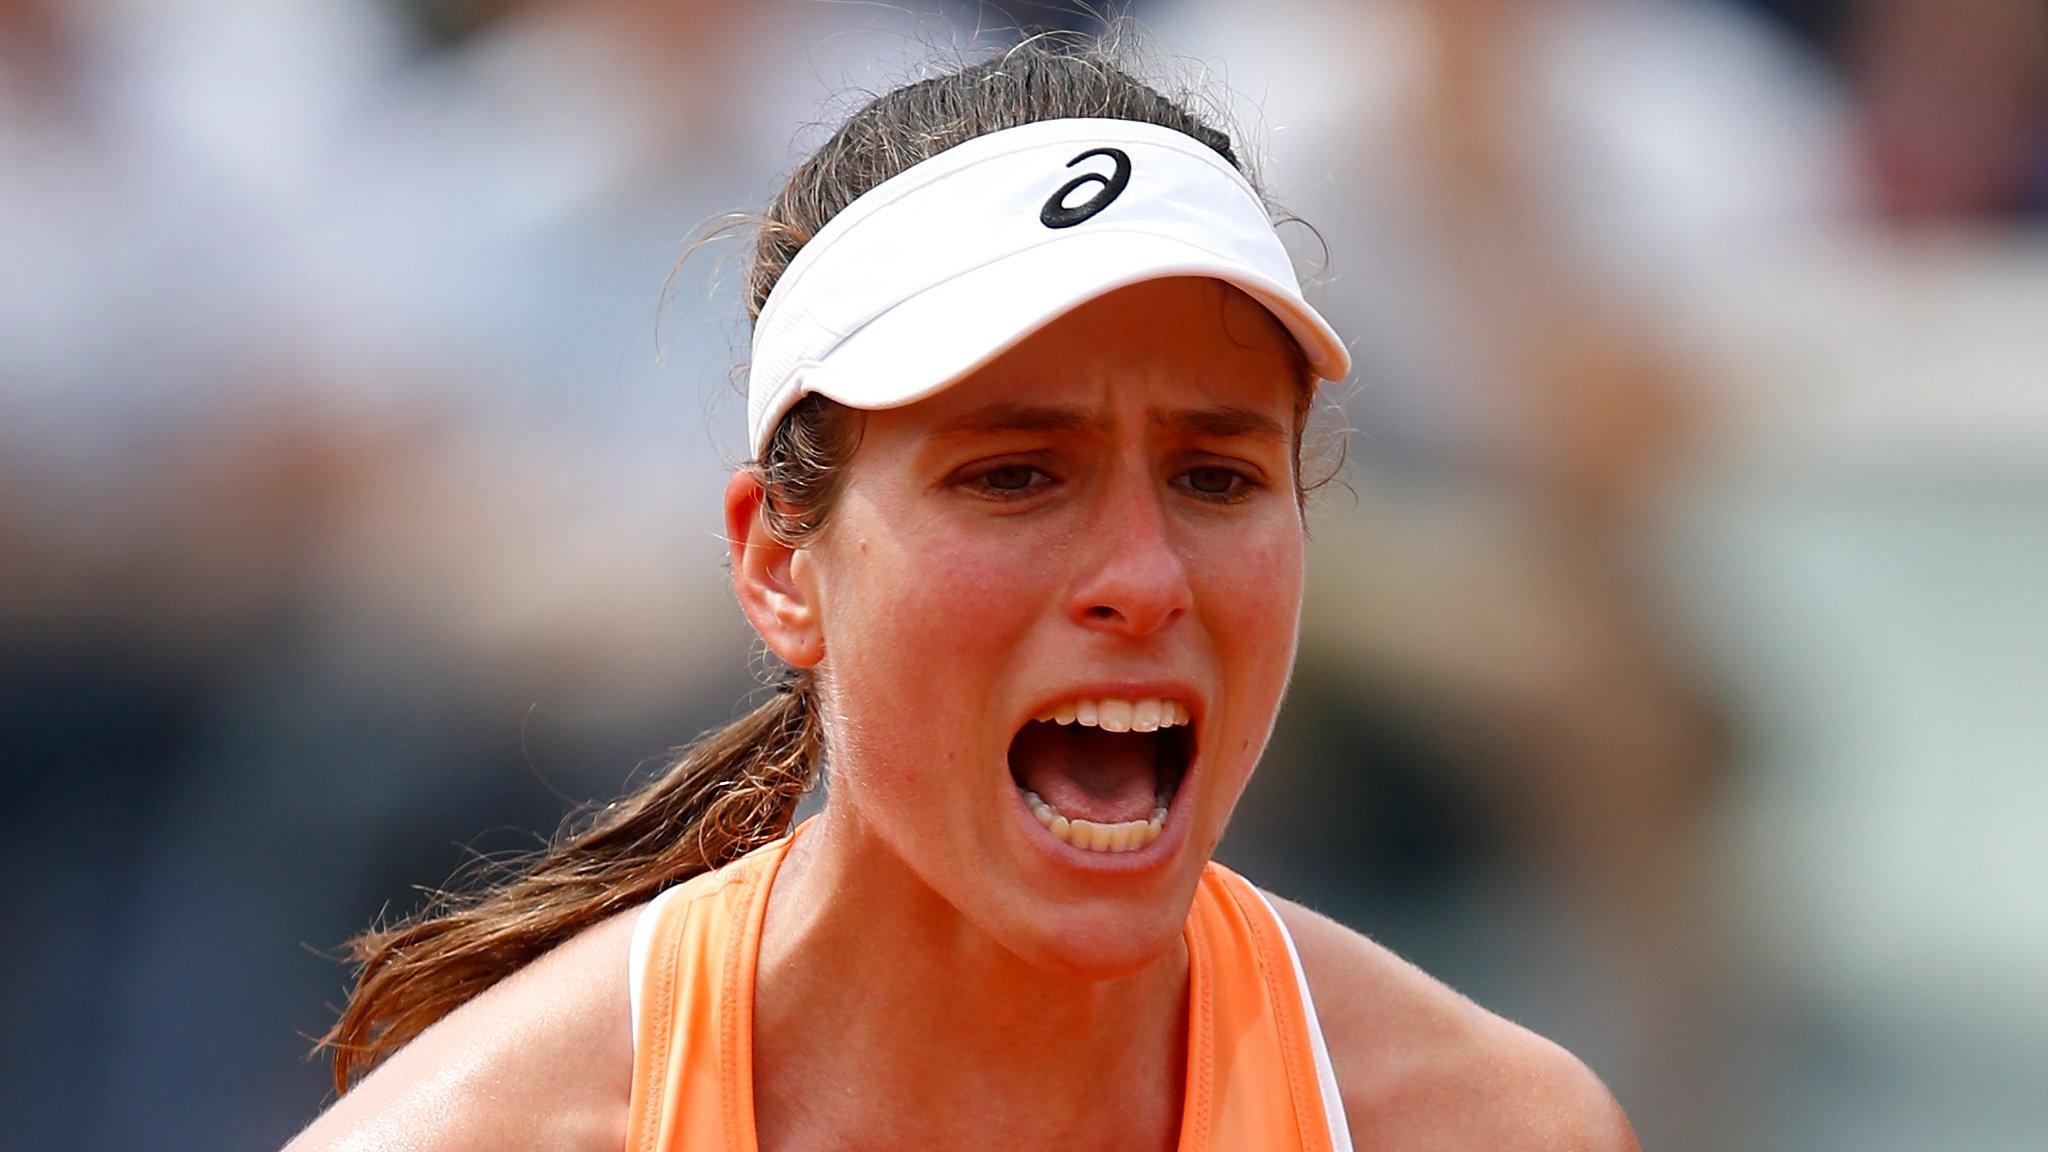 Italian Open: Johanna Konta beats Hsieh Su-wei to set up meeting with Jelena Ostapenko